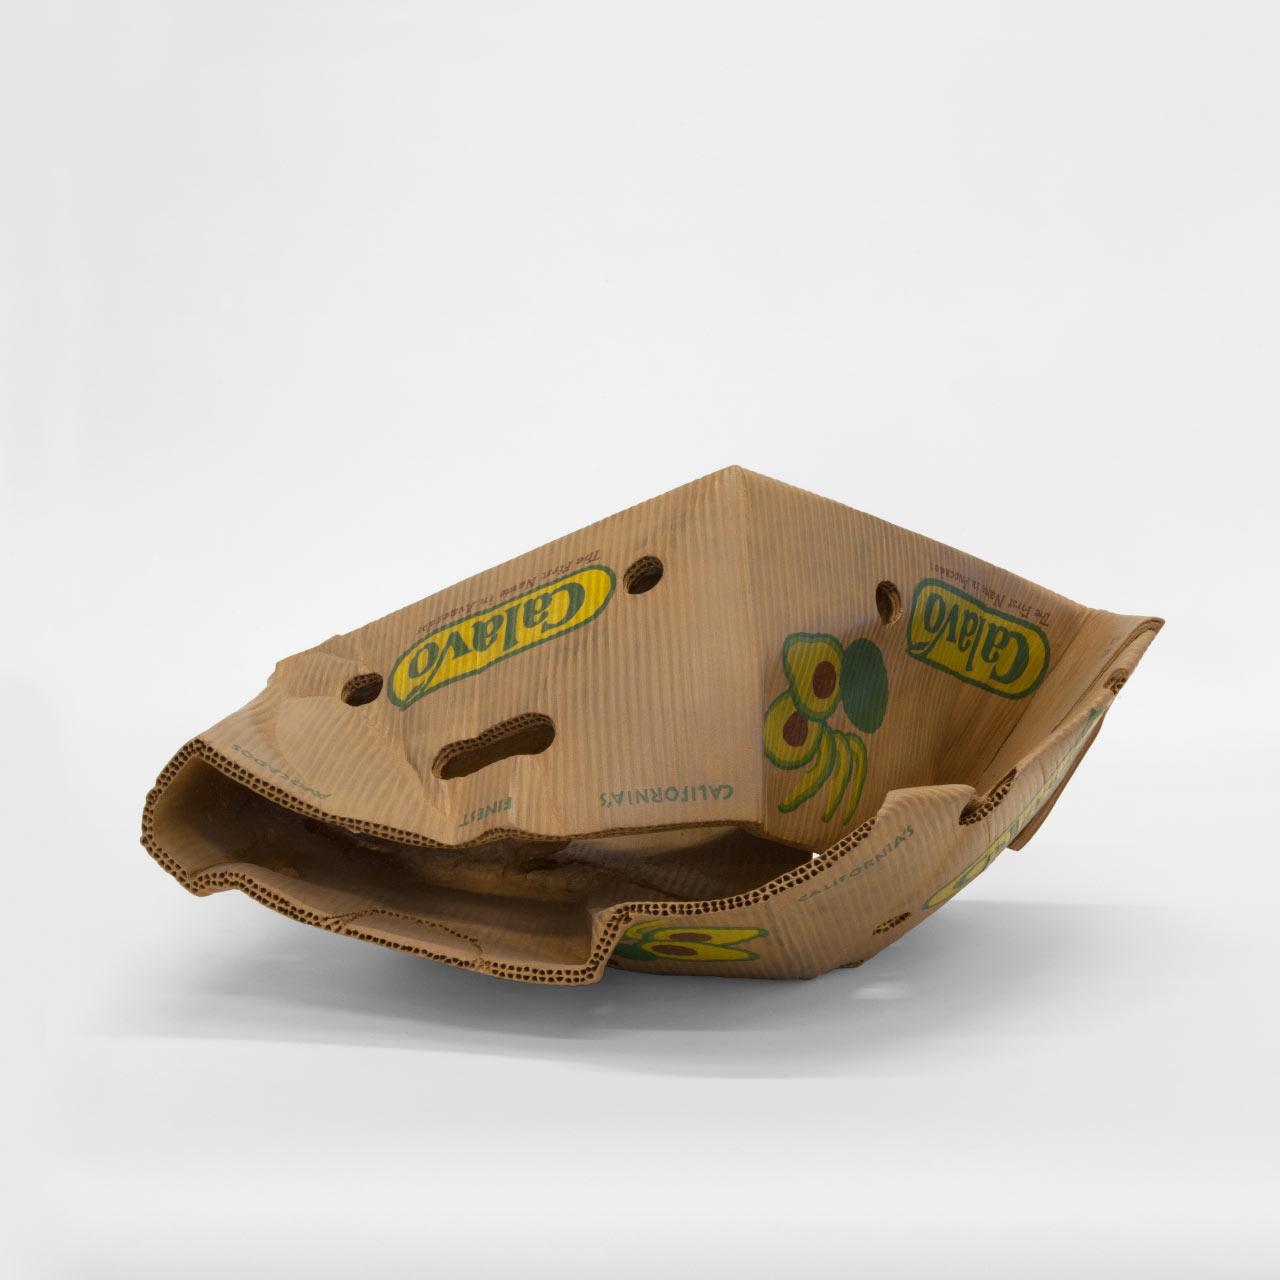 This is Wood: The Sculpture of Matt Johnson